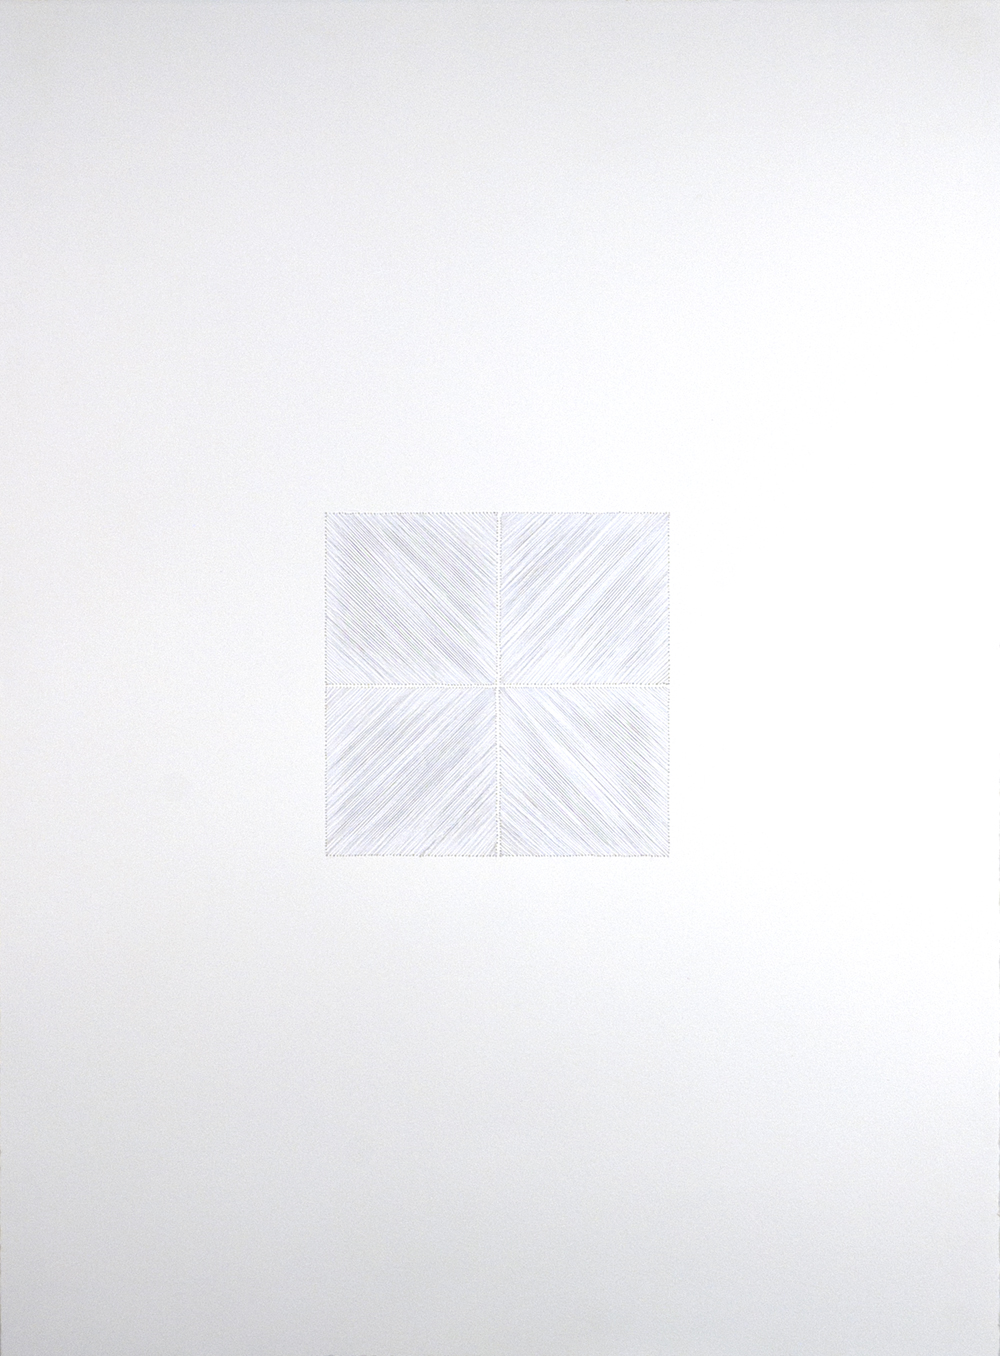 Untitled X, 2012